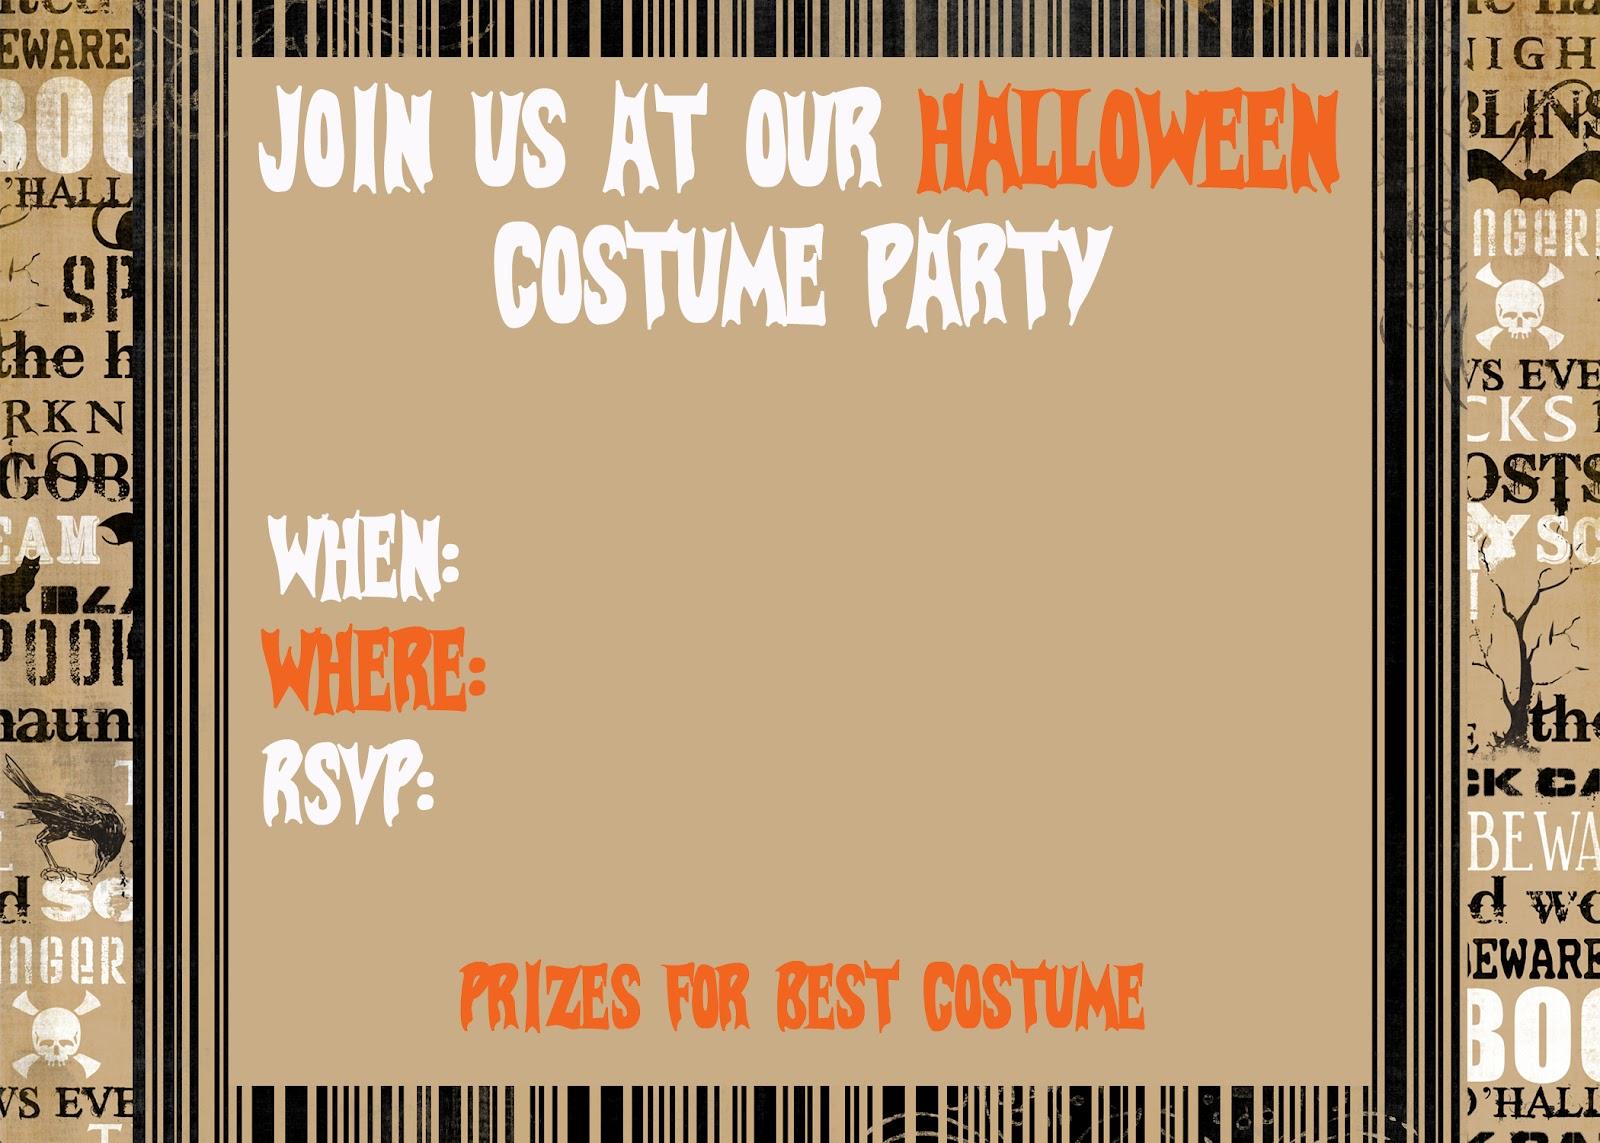 Free Printable Halloween Party Invitations Templates {free} printable ...: pixgood.com/free-printable-halloween-party-invitations-templates.html